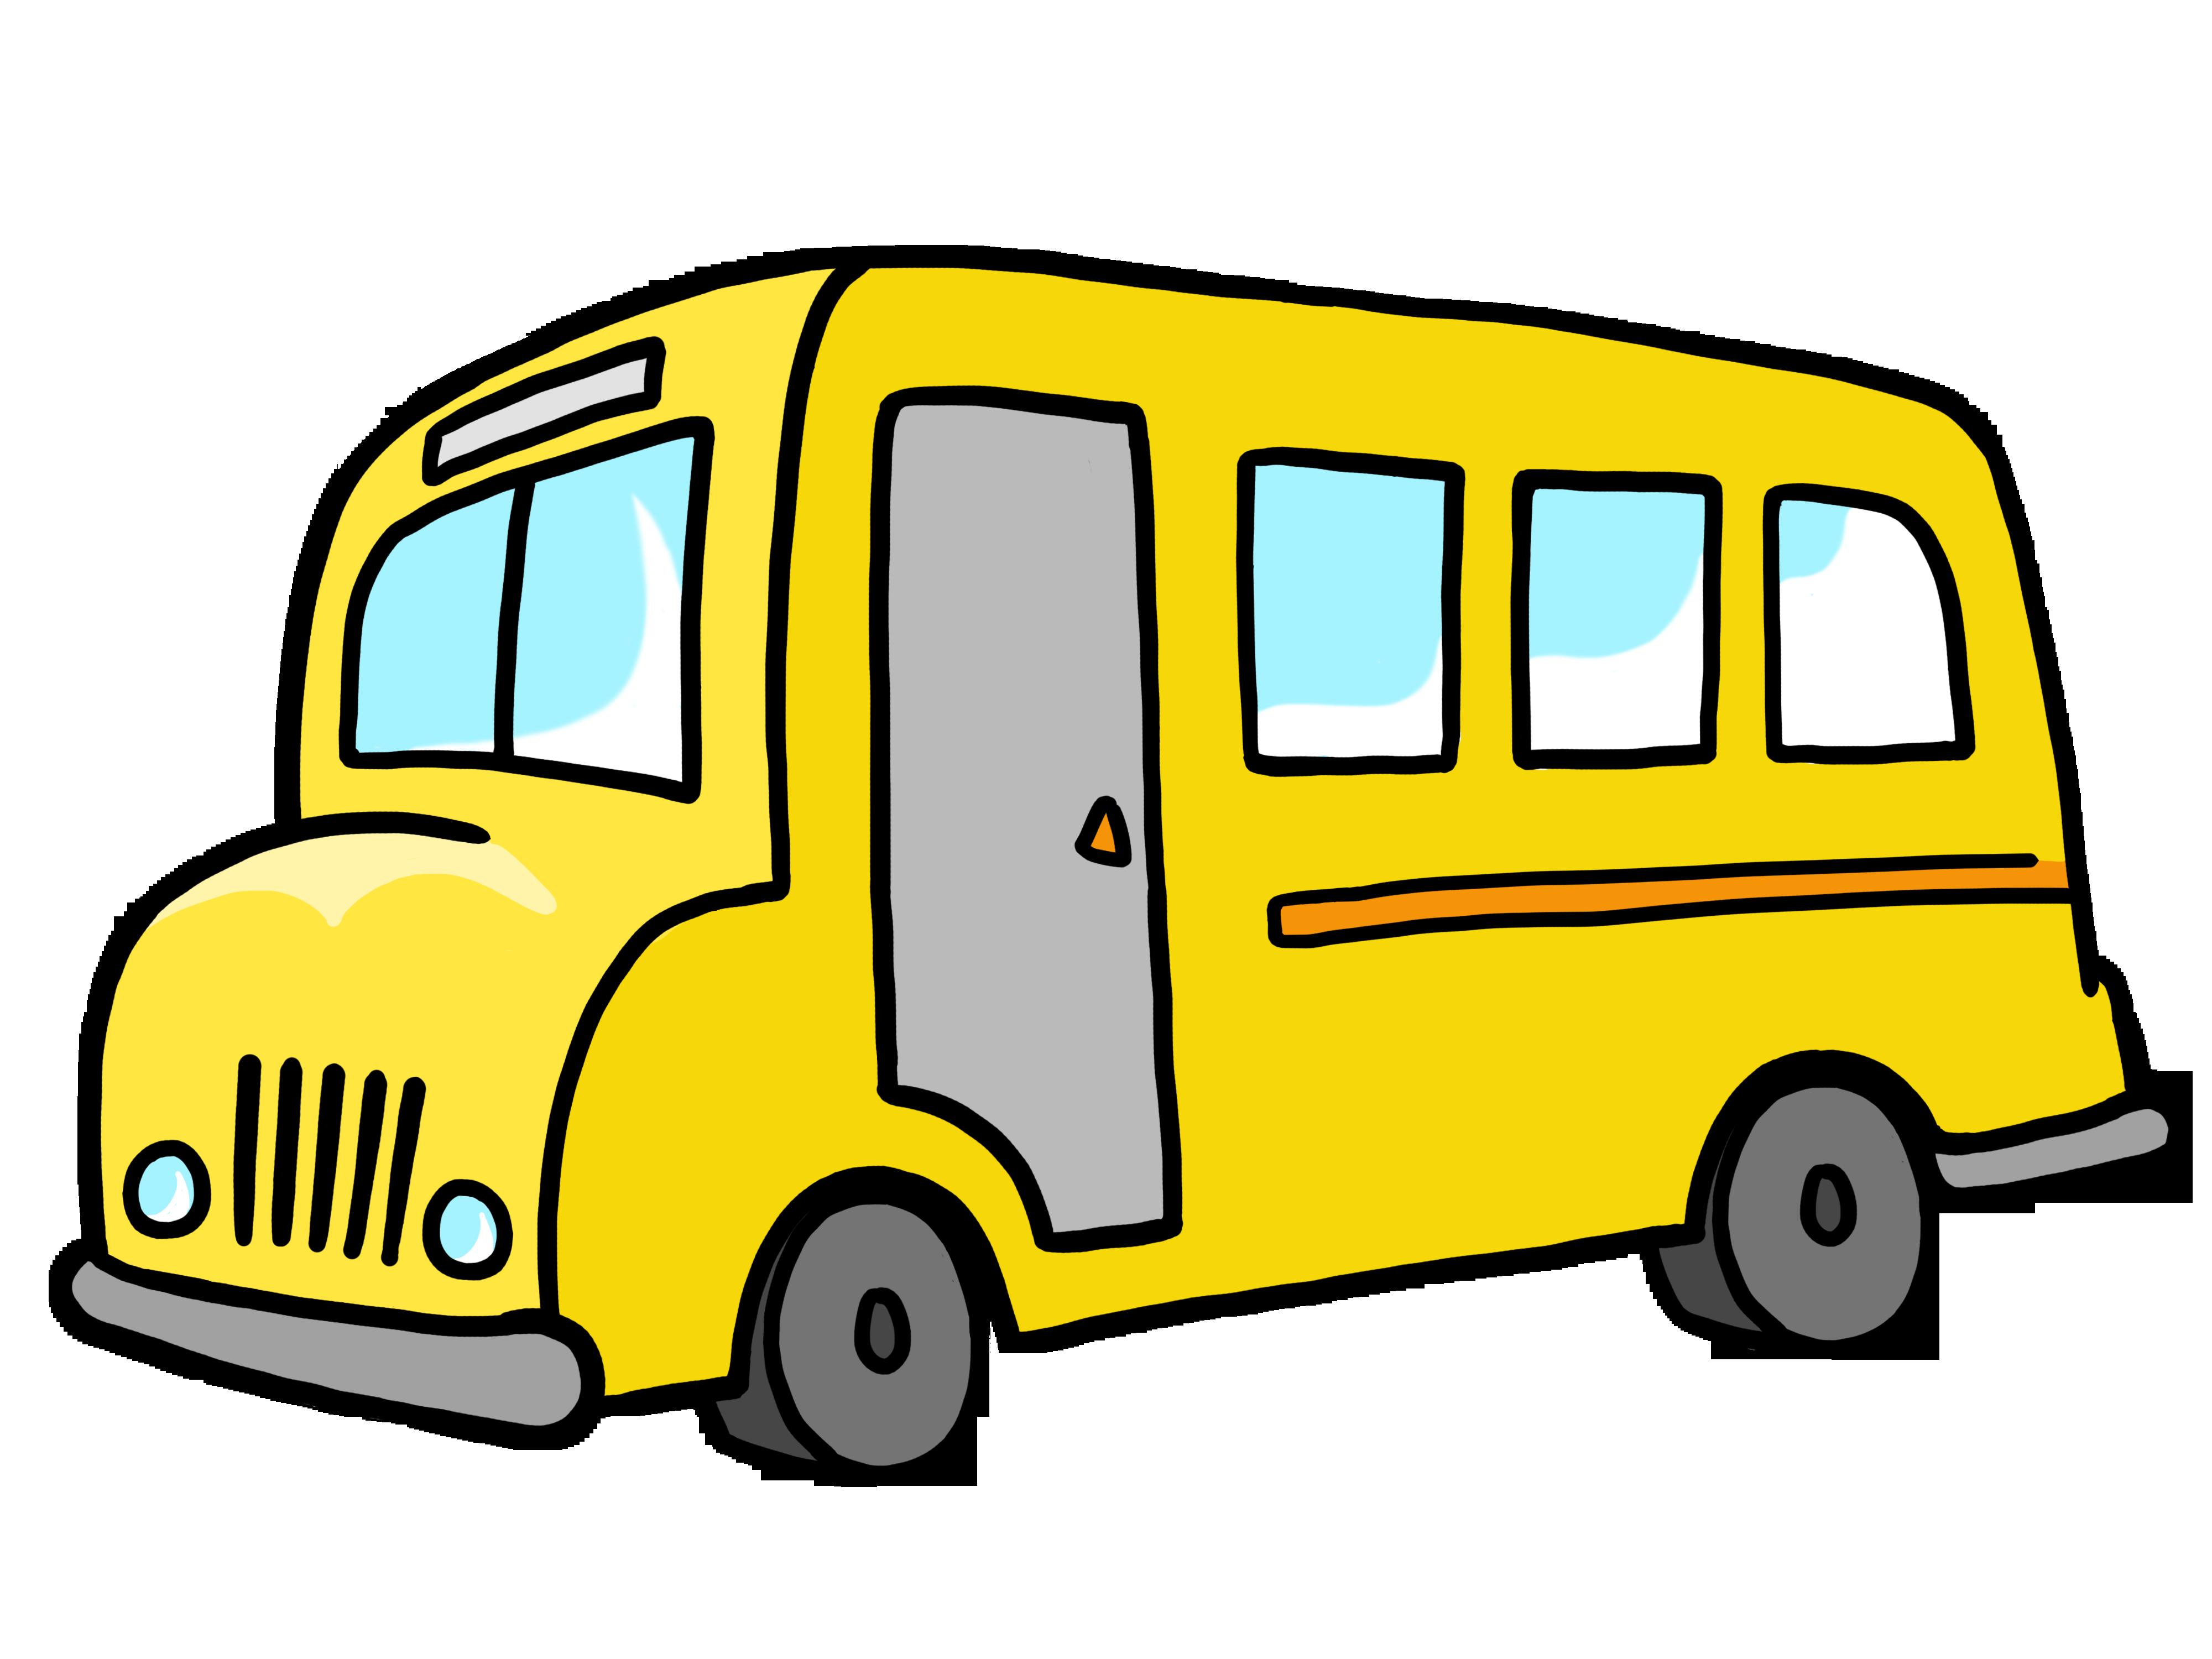 Bus Clip Art Free Images | Clipart Panda - Free Clipart Images